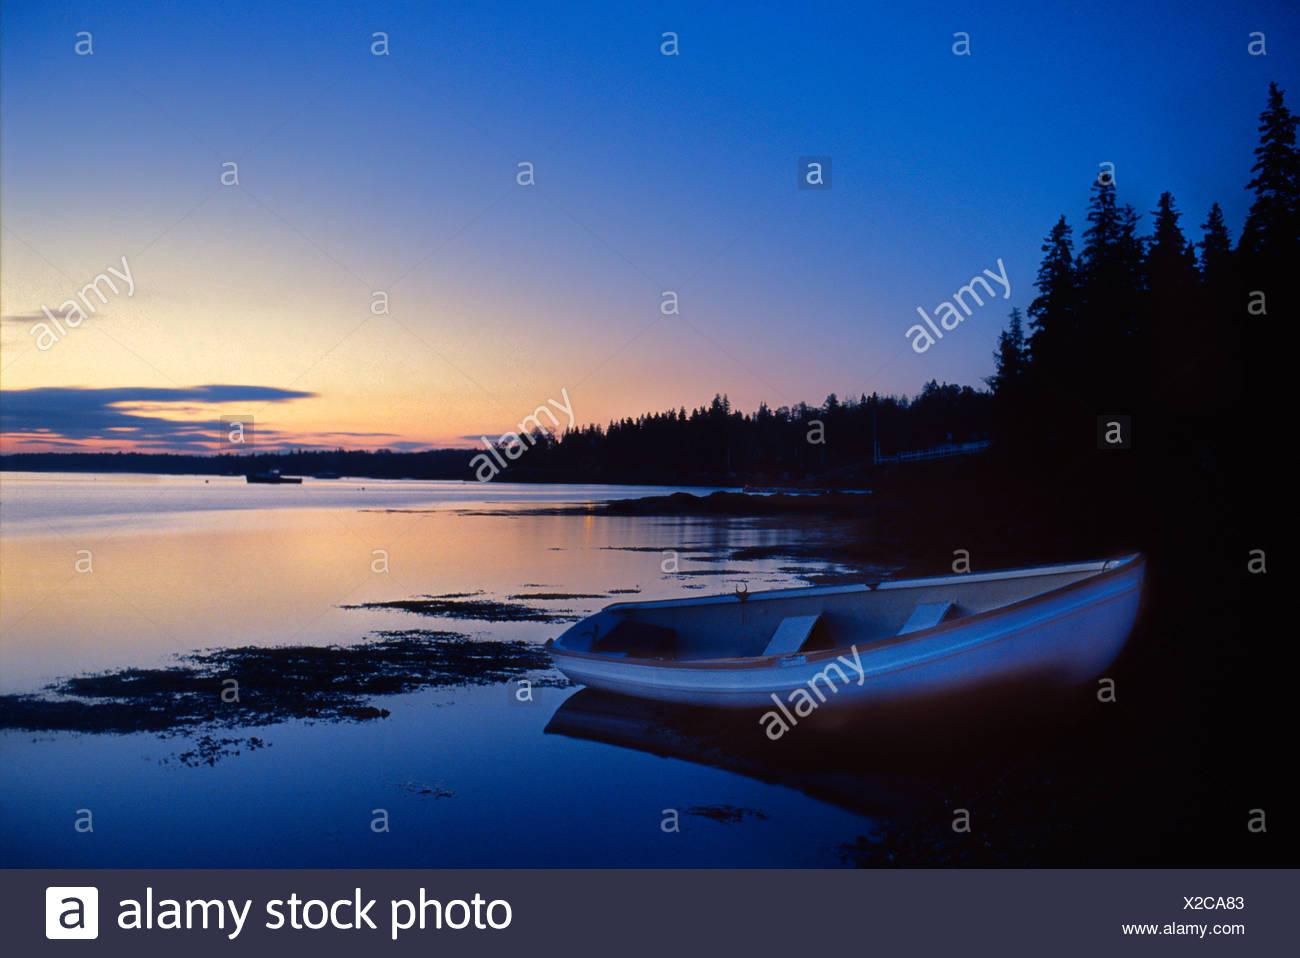 Tranquil rowboat at dusk, Maine - Stock Image